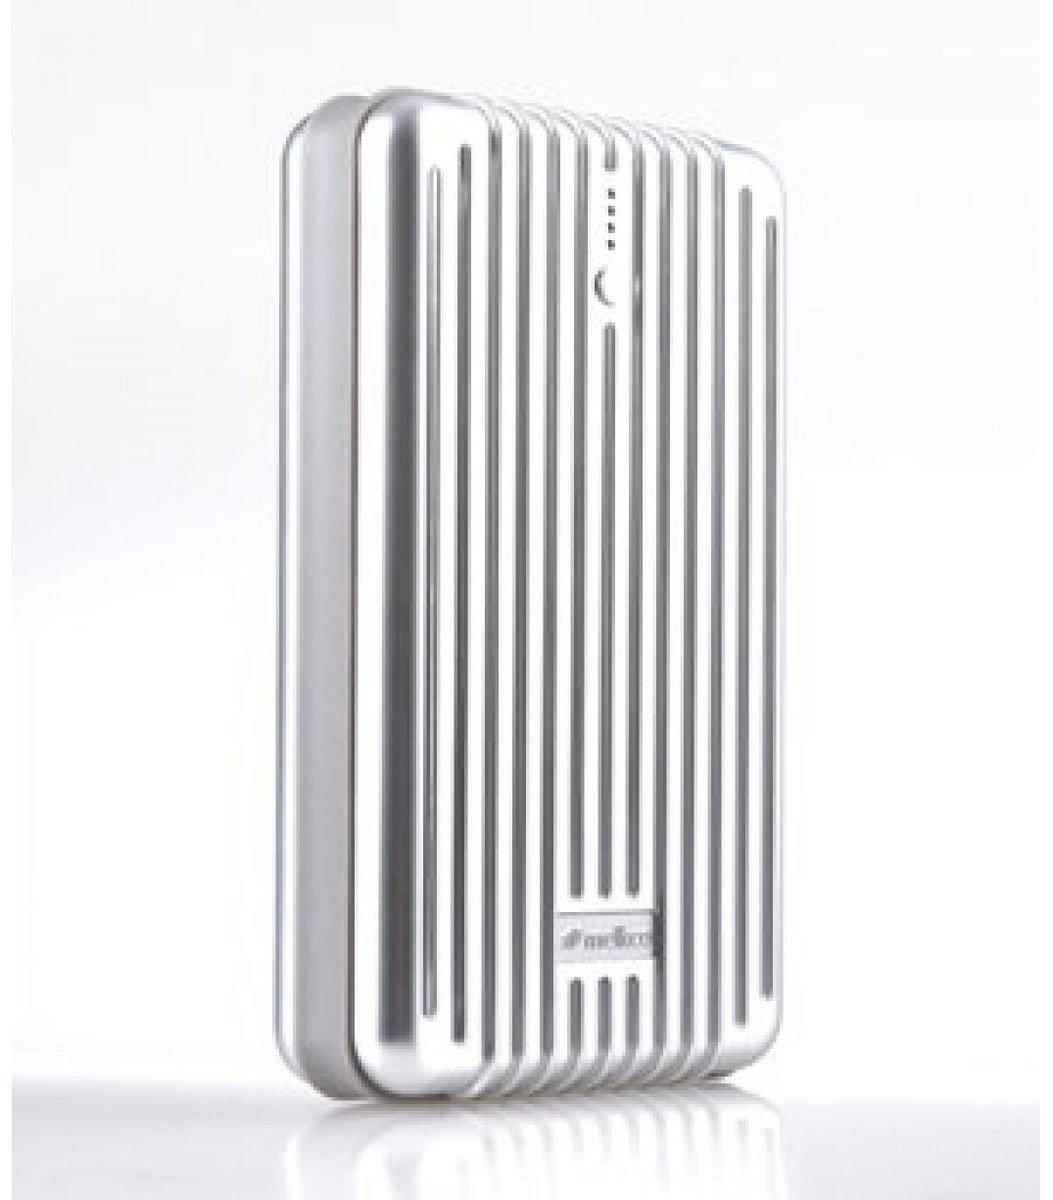 Gofove T-Slim Queen系列行動電源(10,400mAh) - 銀色